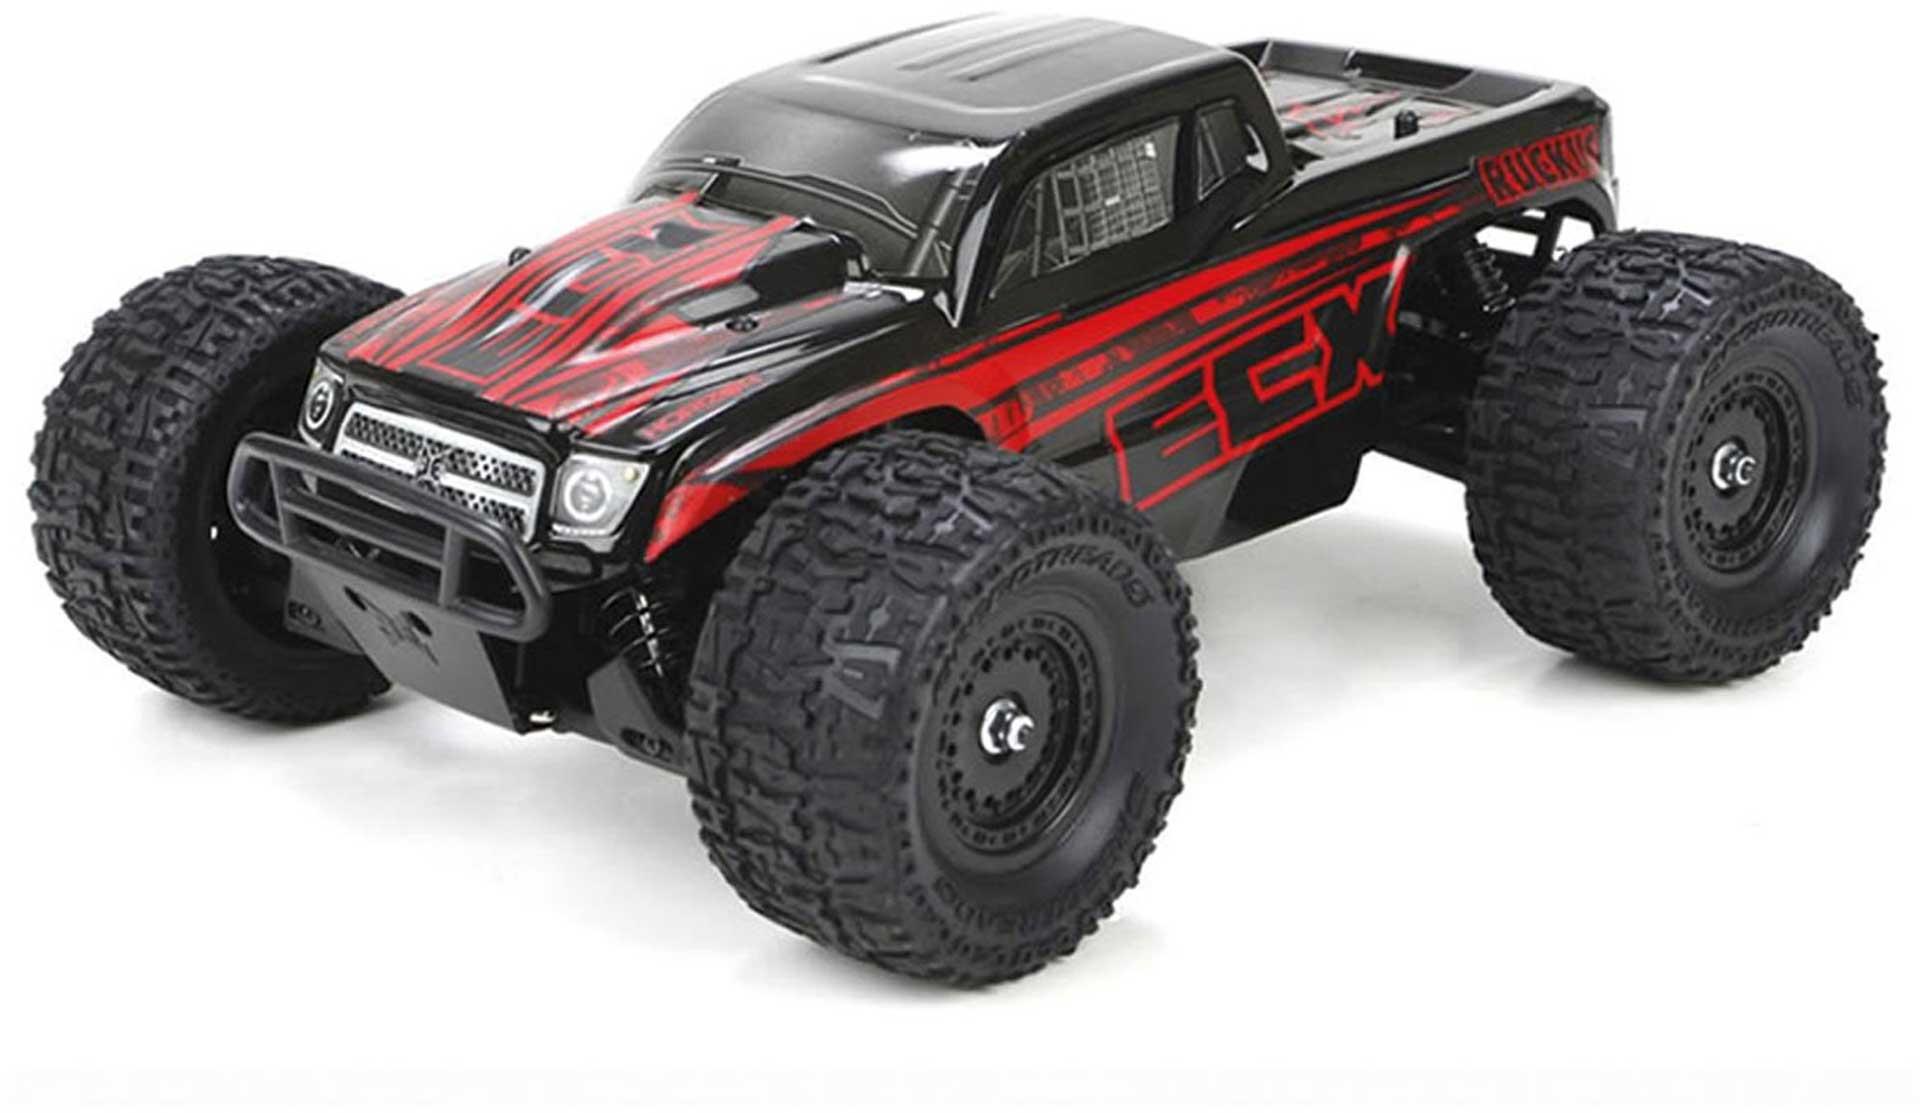 ECX RUCKUS 1/18 4WD MONSTER TRUCK SCHWARZ ROT RTR